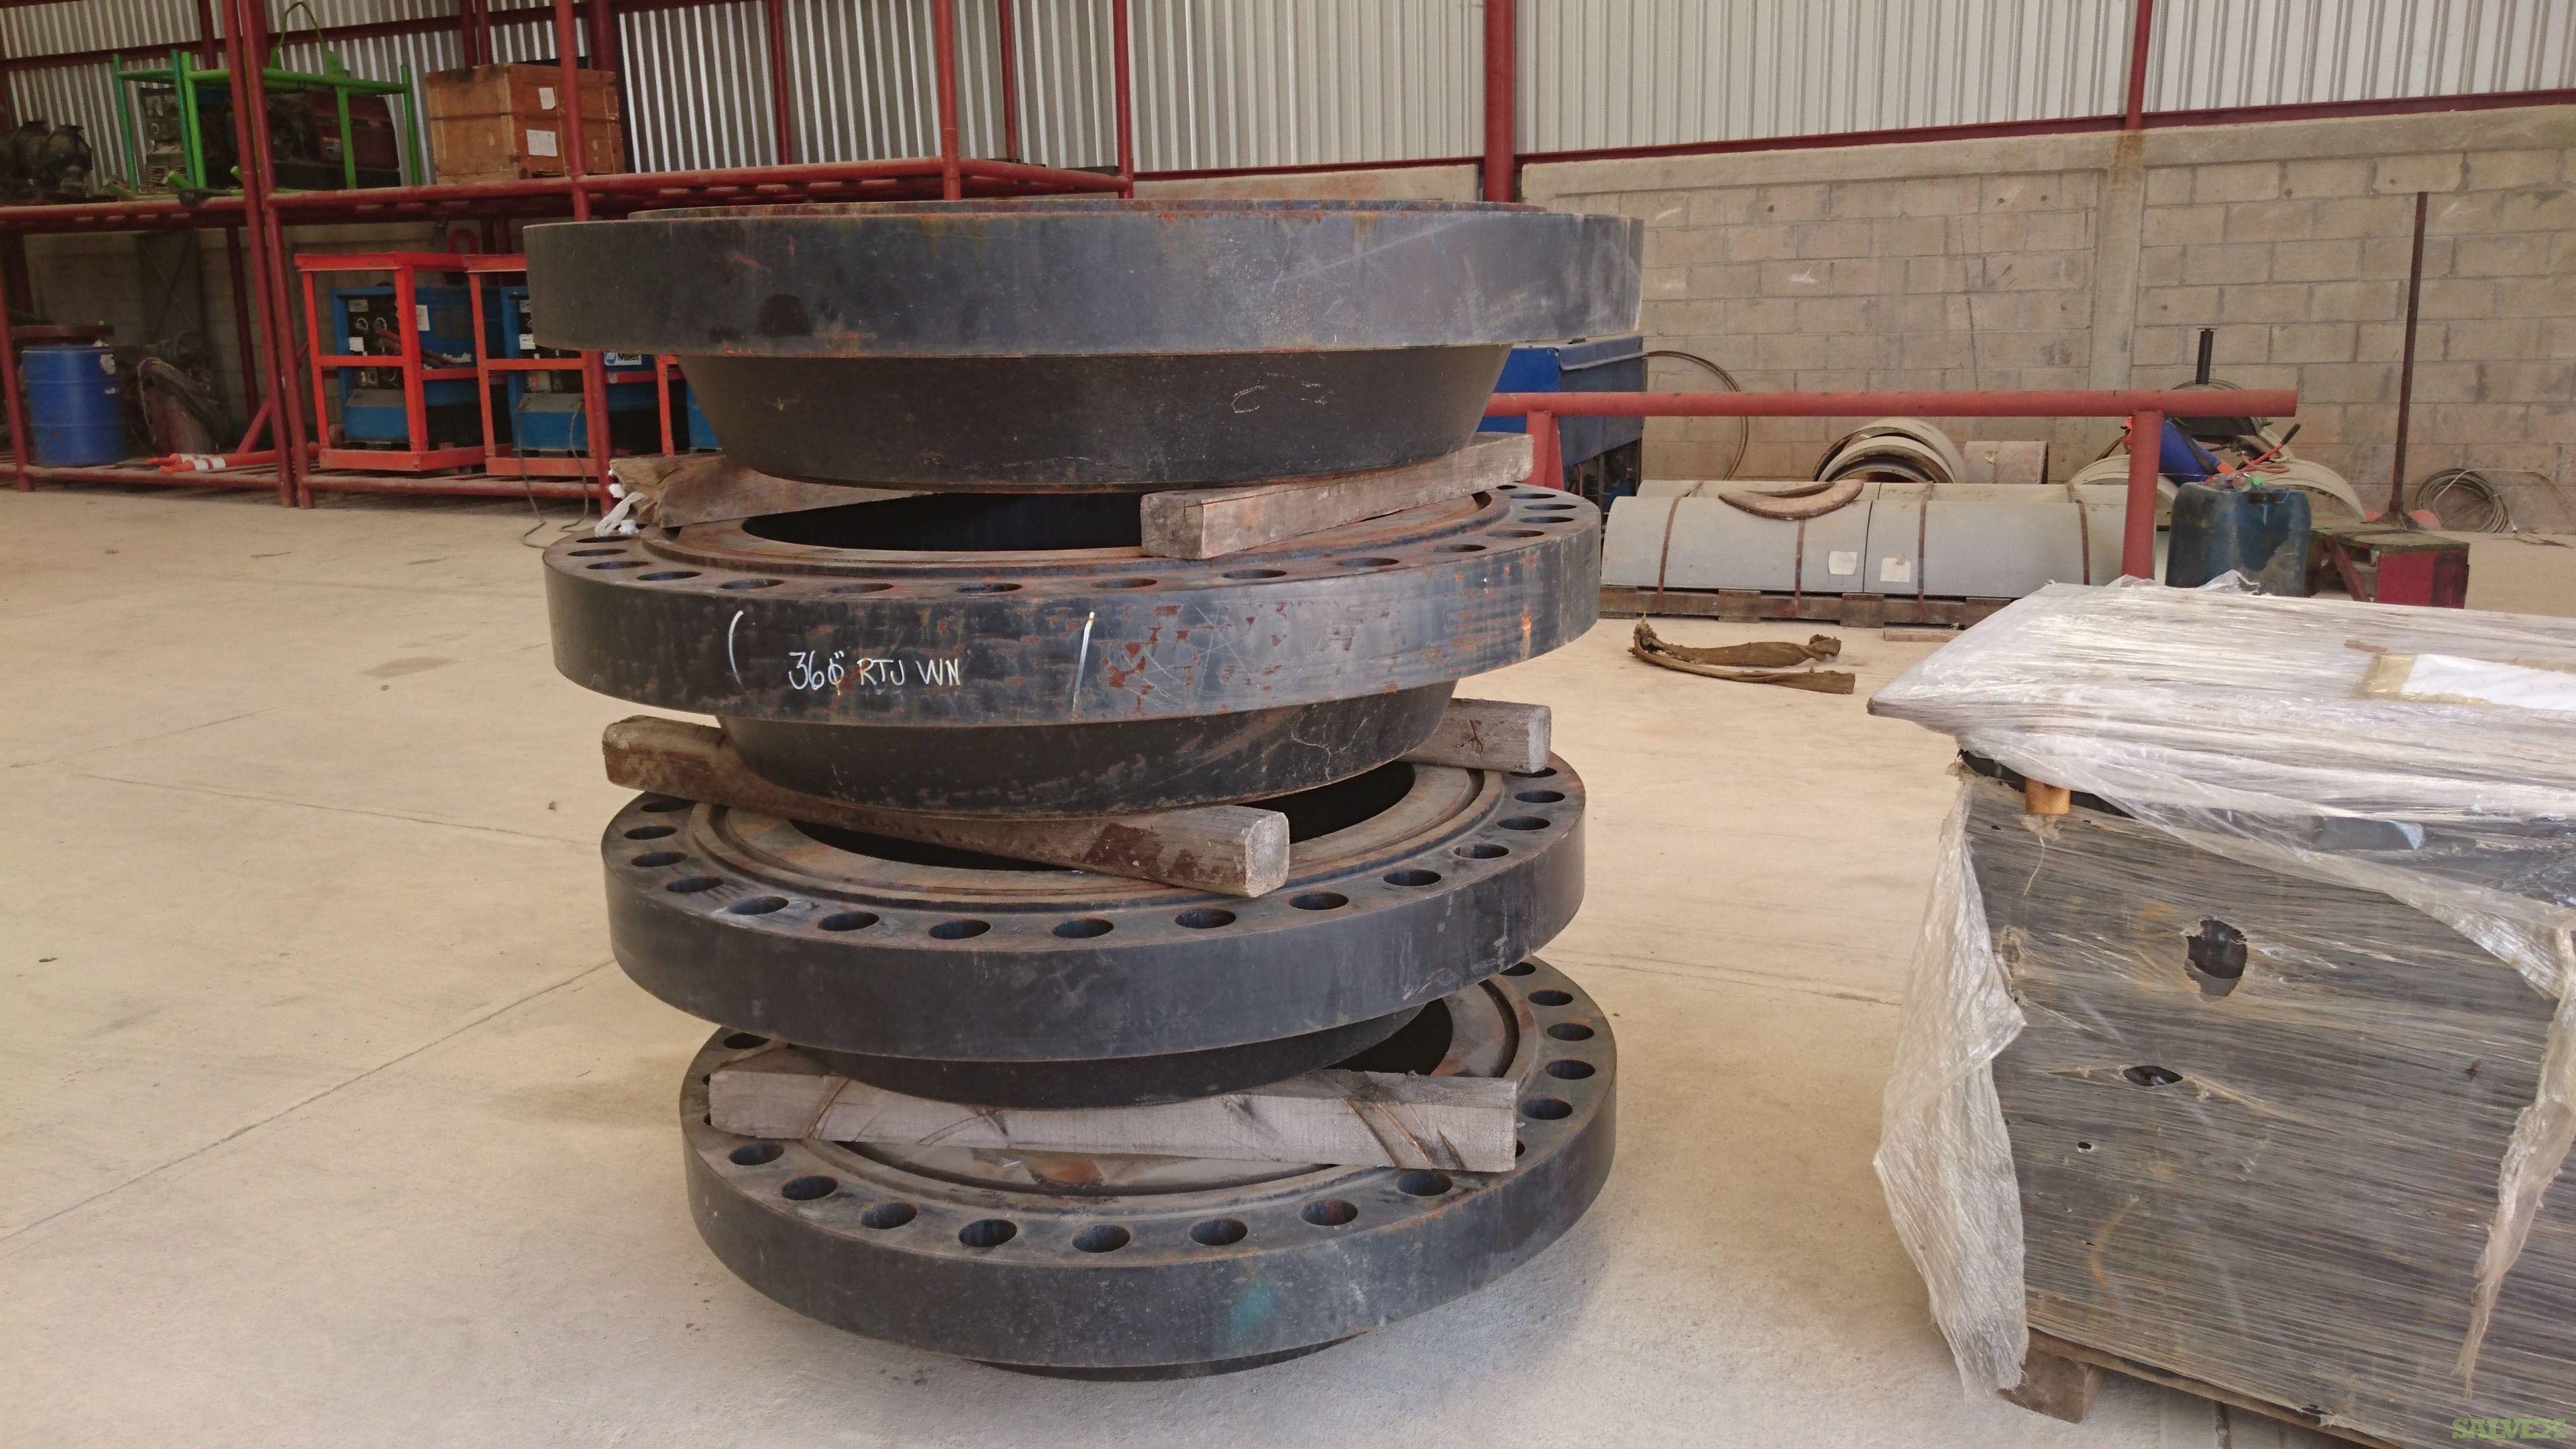 Welding Neck Flange, ASTM A694 F65 & ASTM A105 36 600# for Sour Service Nace (7 Units)